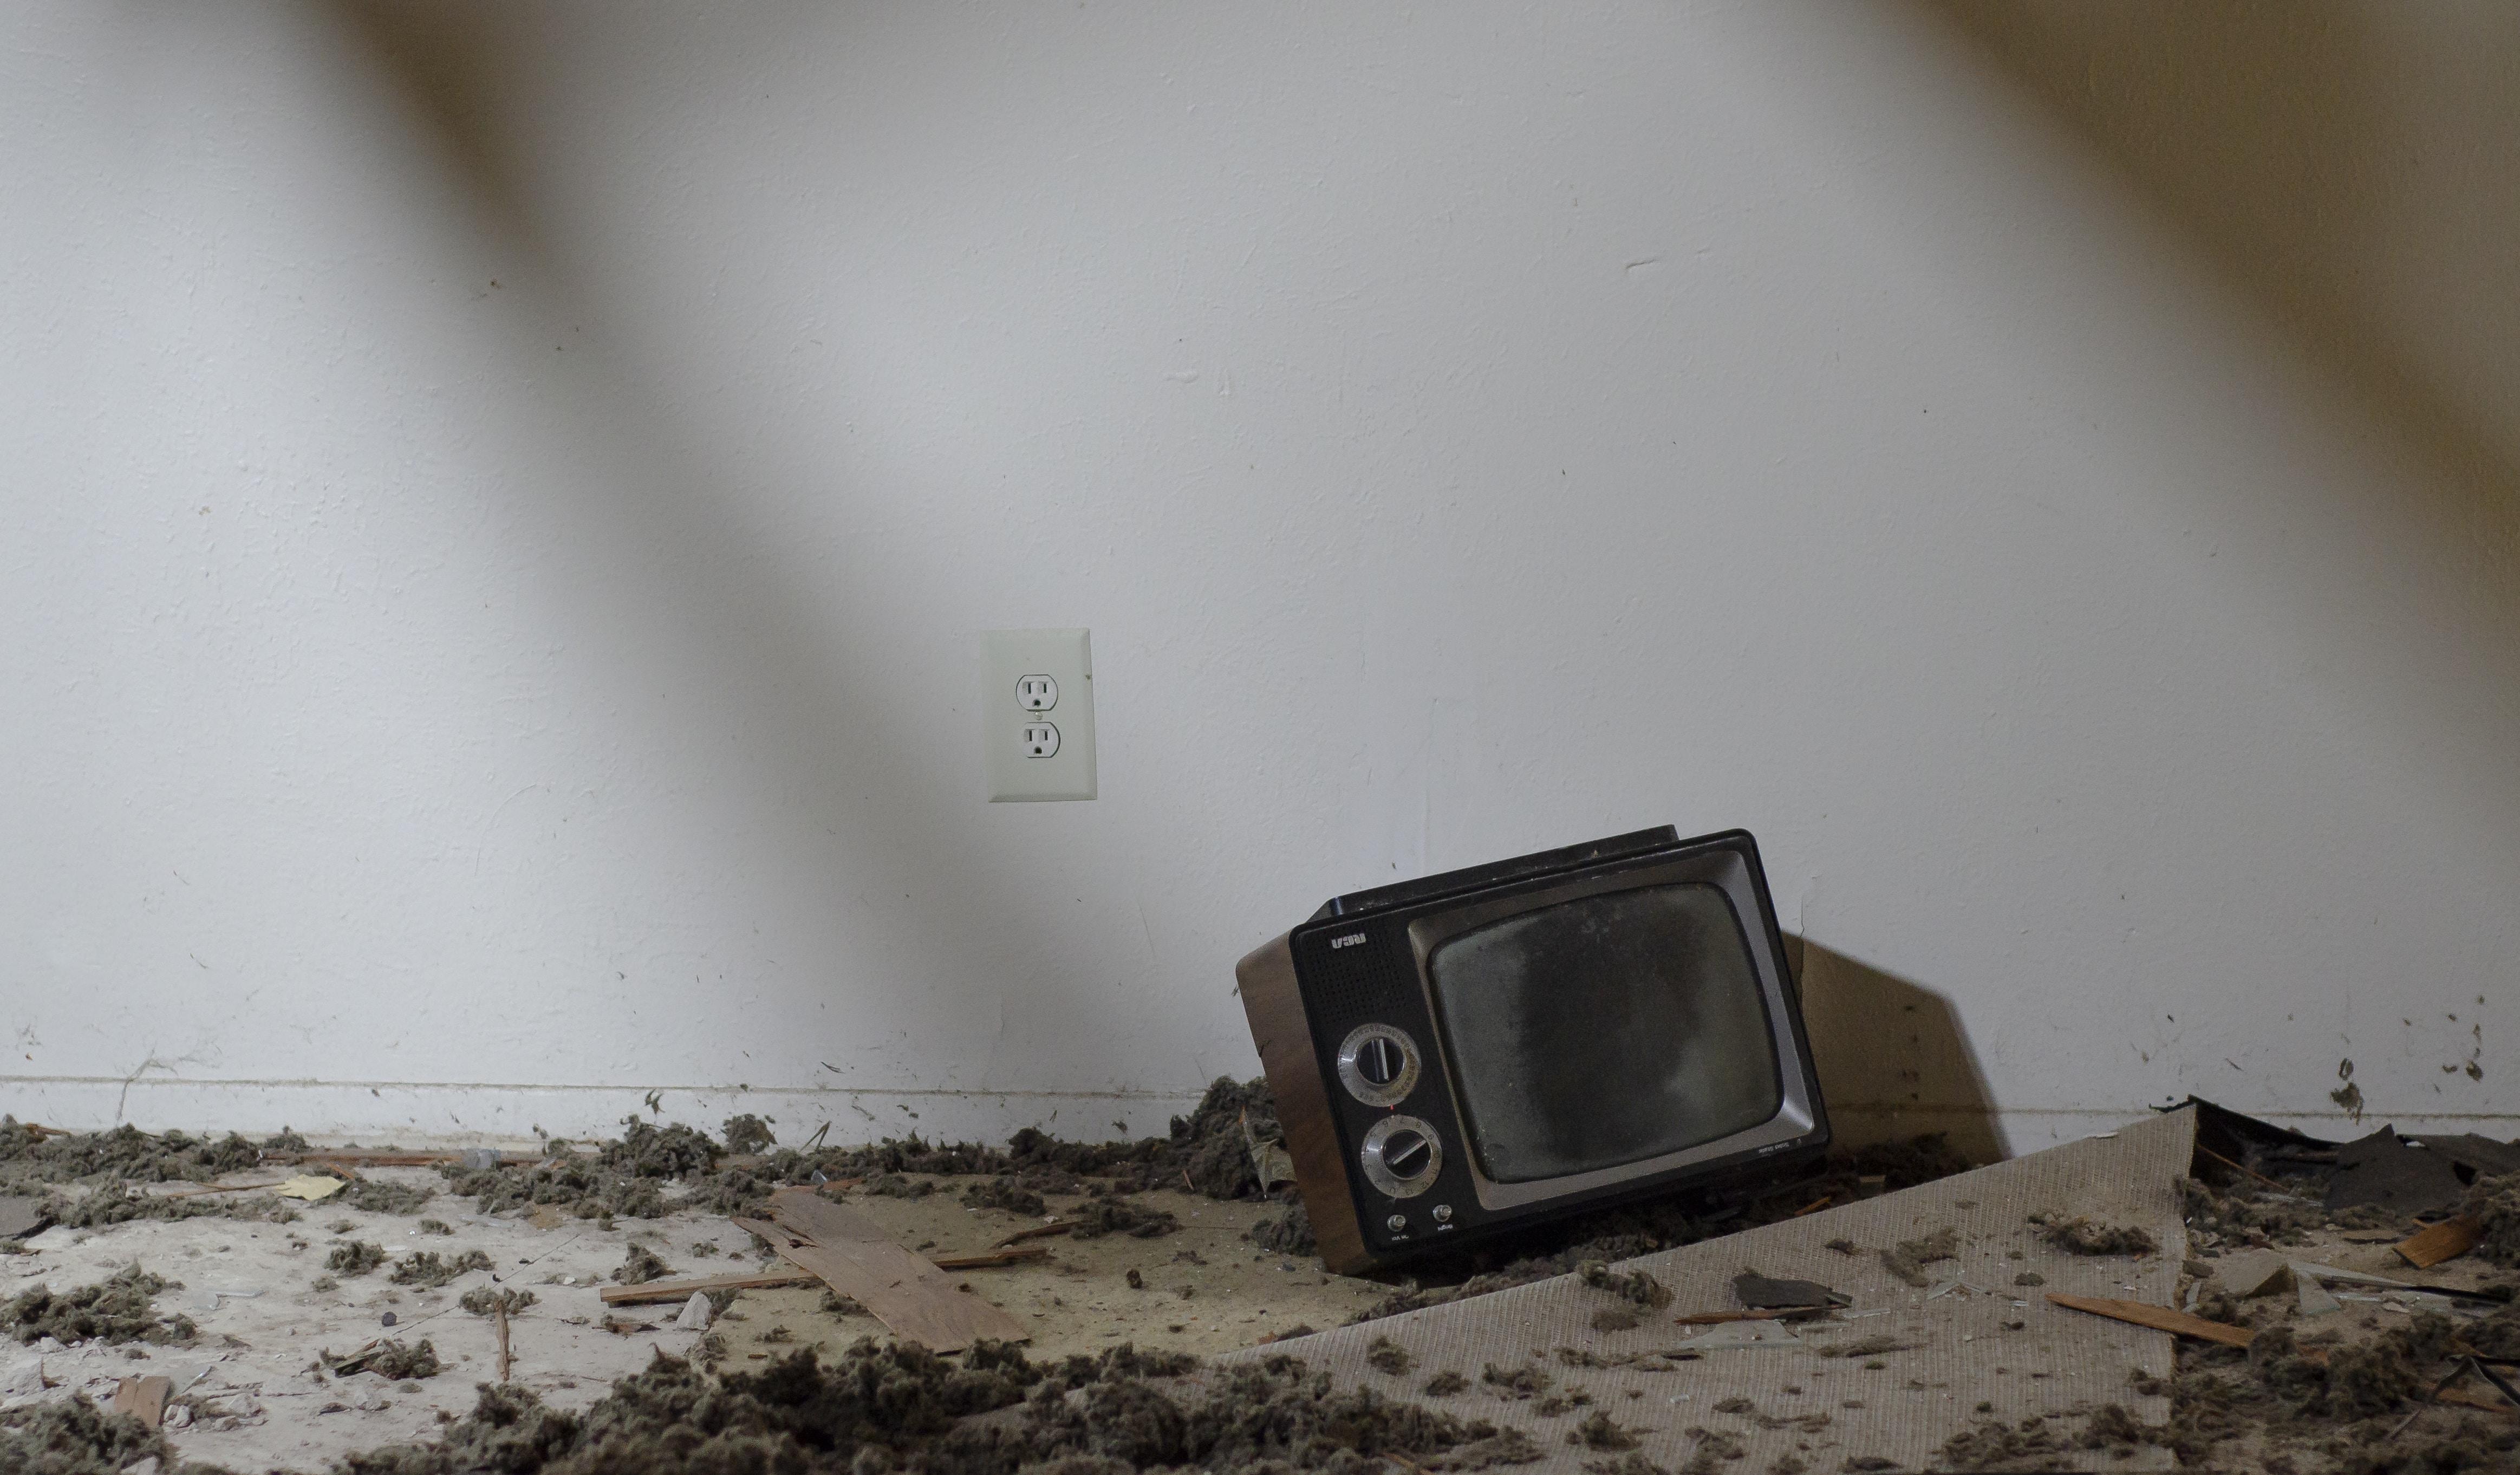 vintage black television on floor with debris